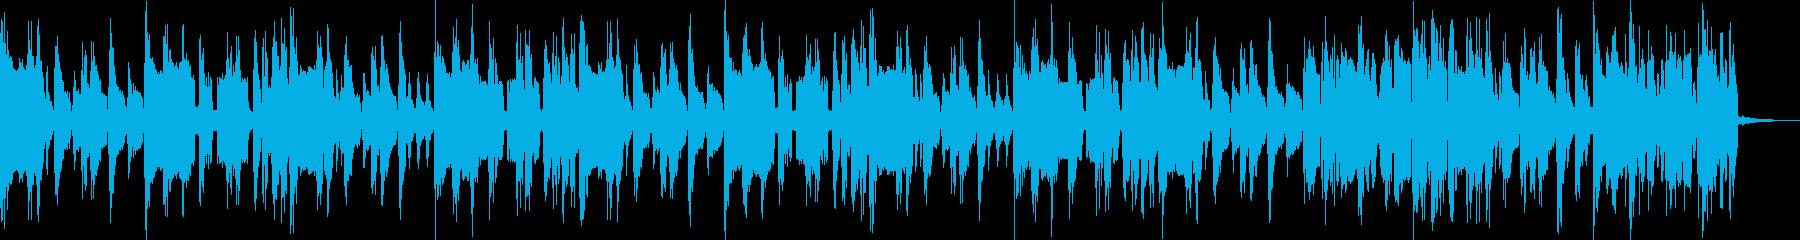 EDMドロップオンリー 08の再生済みの波形